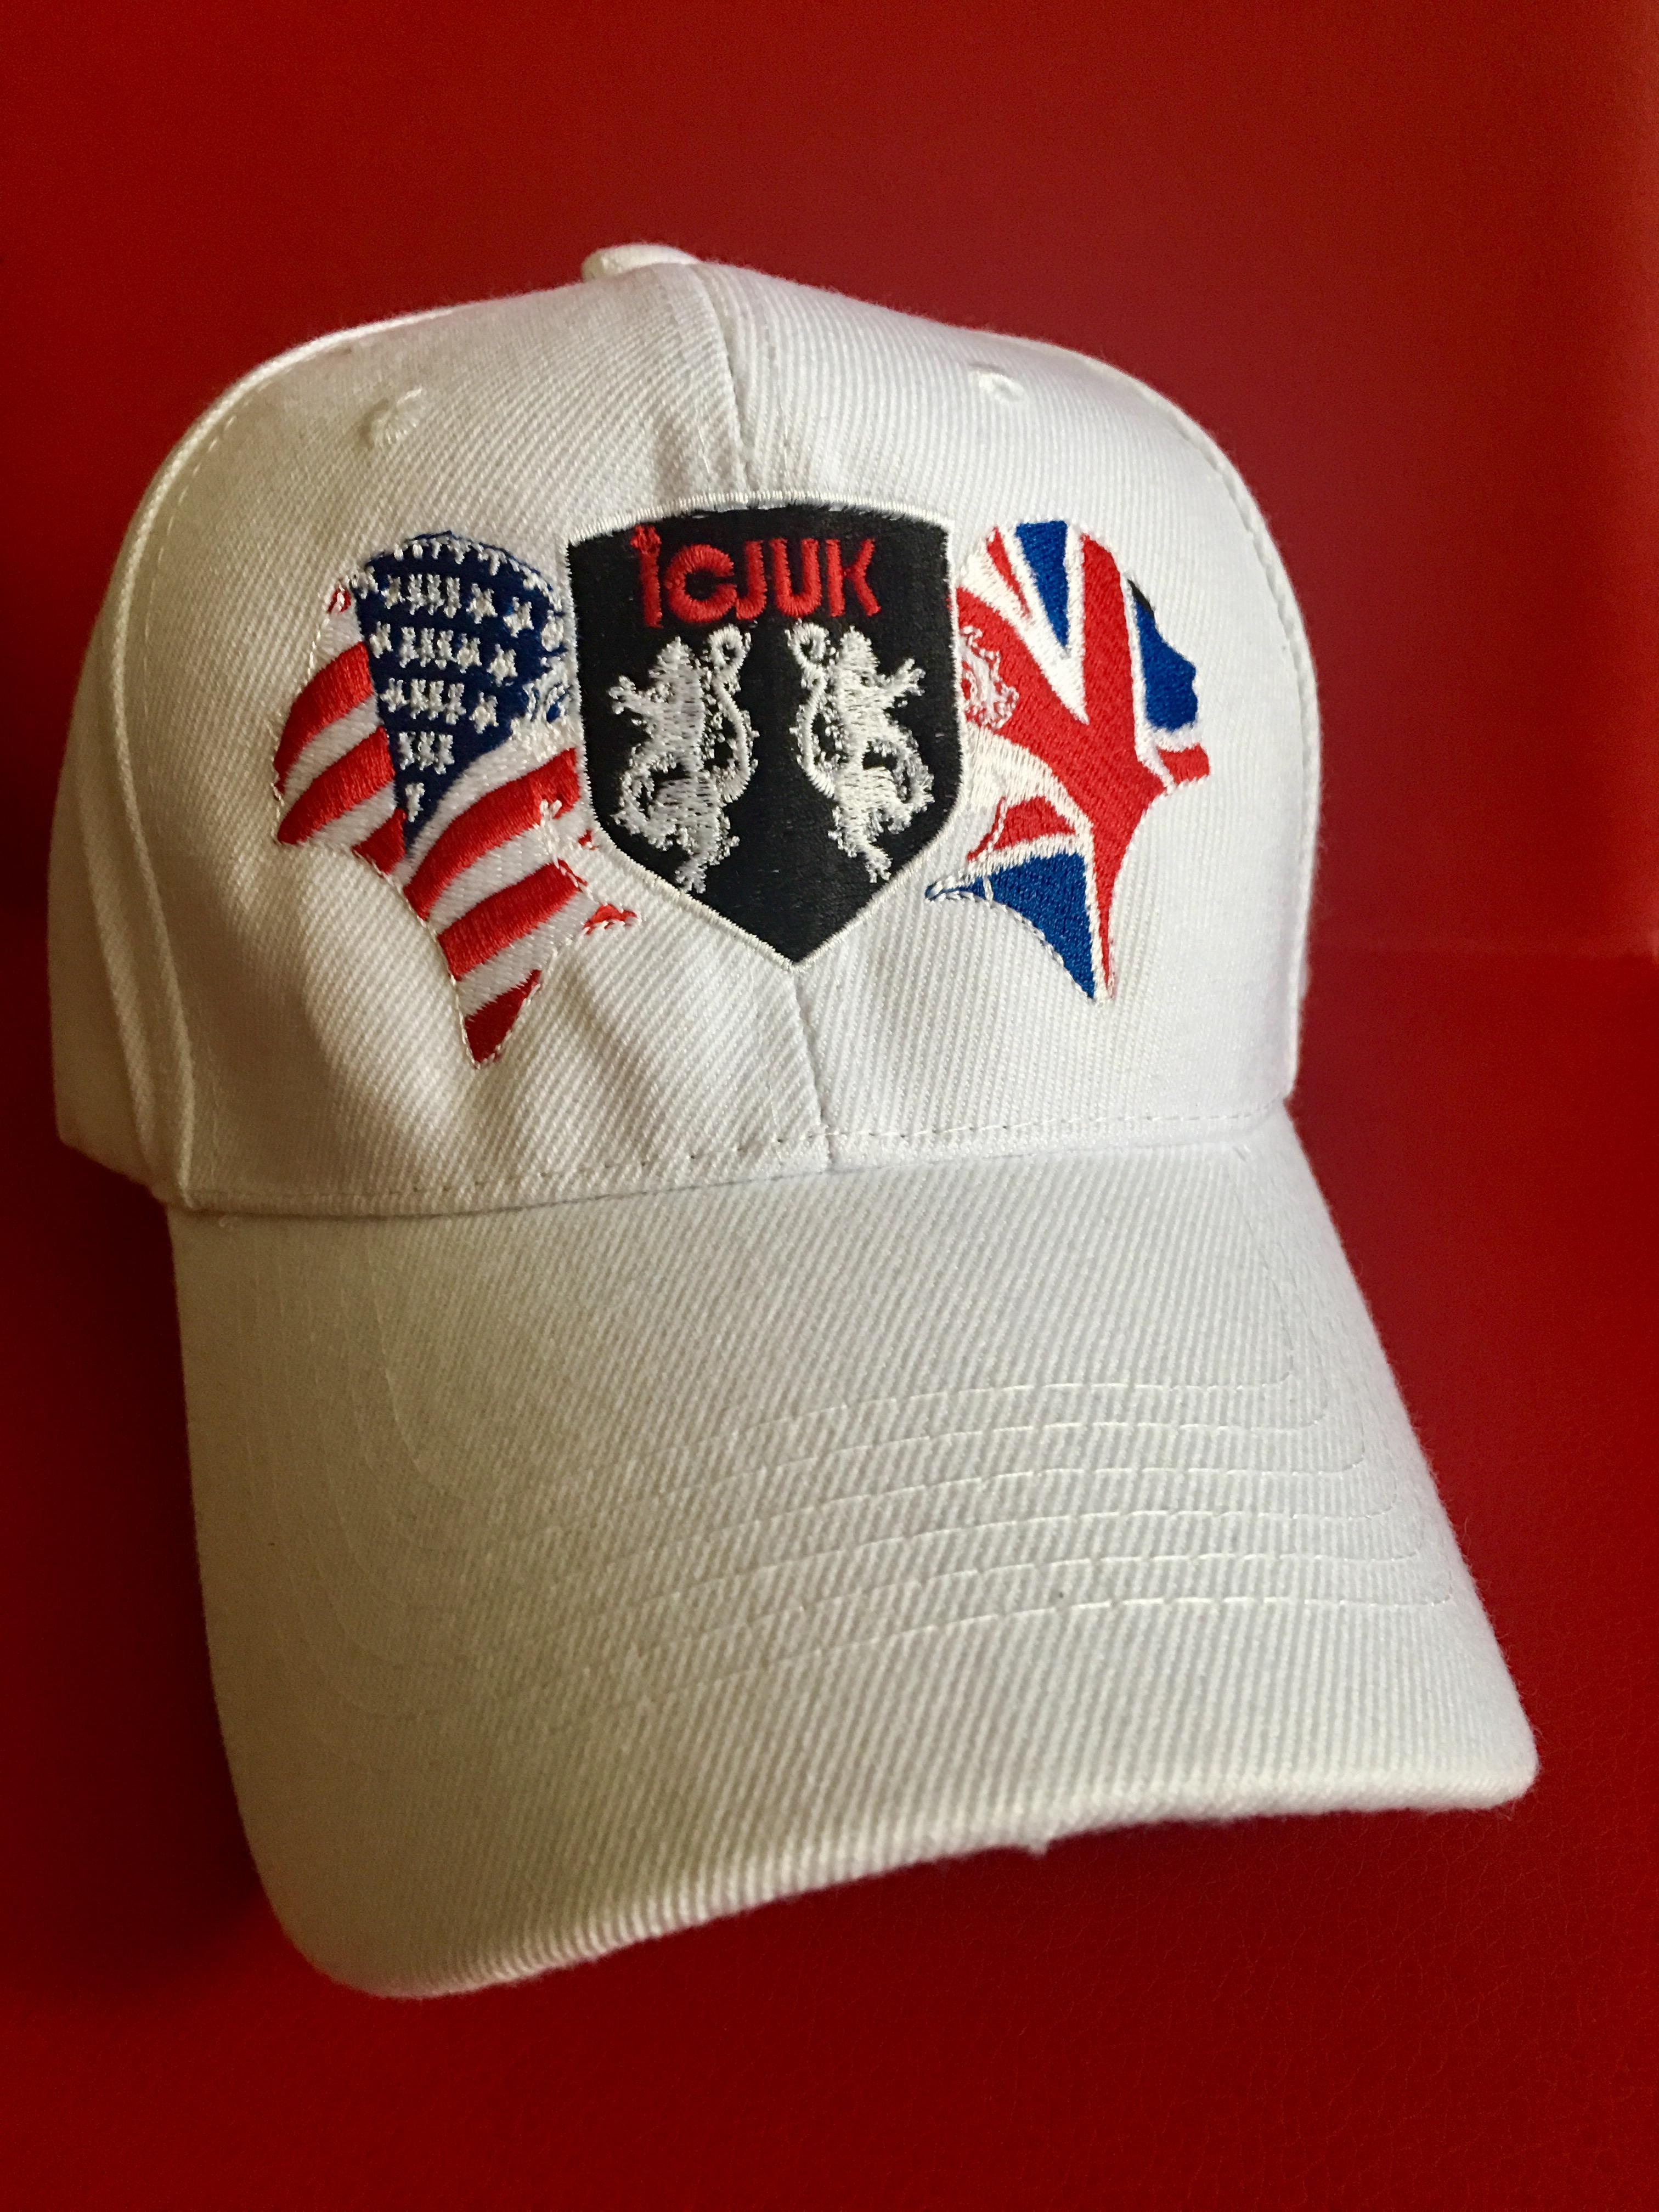 Embroidered Icjuk Rock Amp Roll Union Jane Baseball Cap